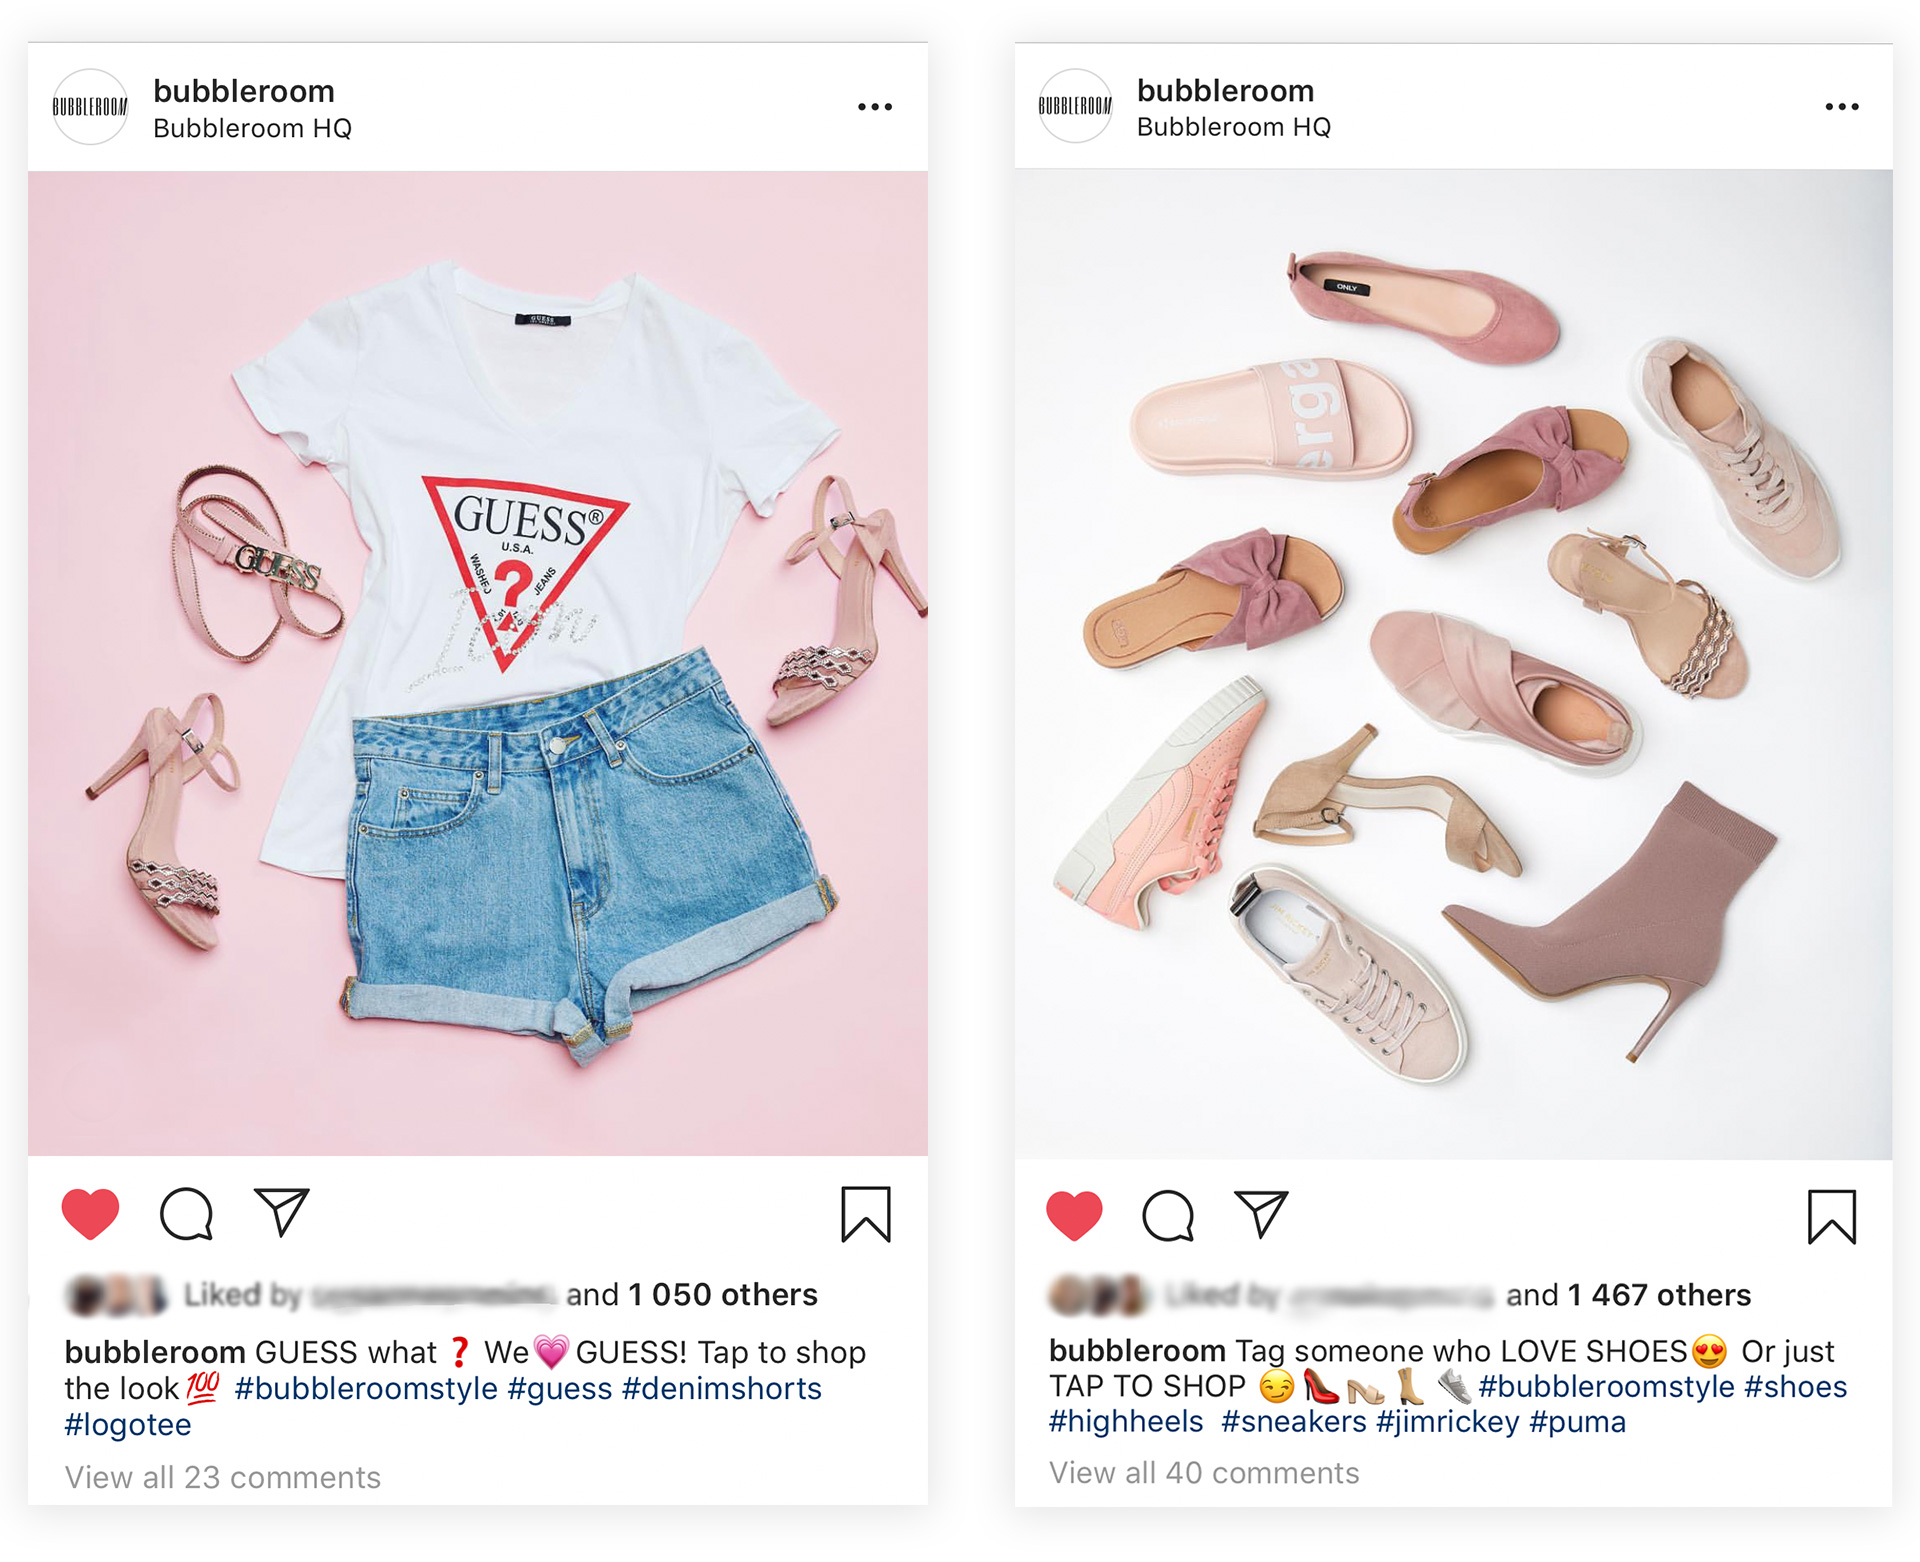 Bubbleroom-photoshot-instagram.jpg